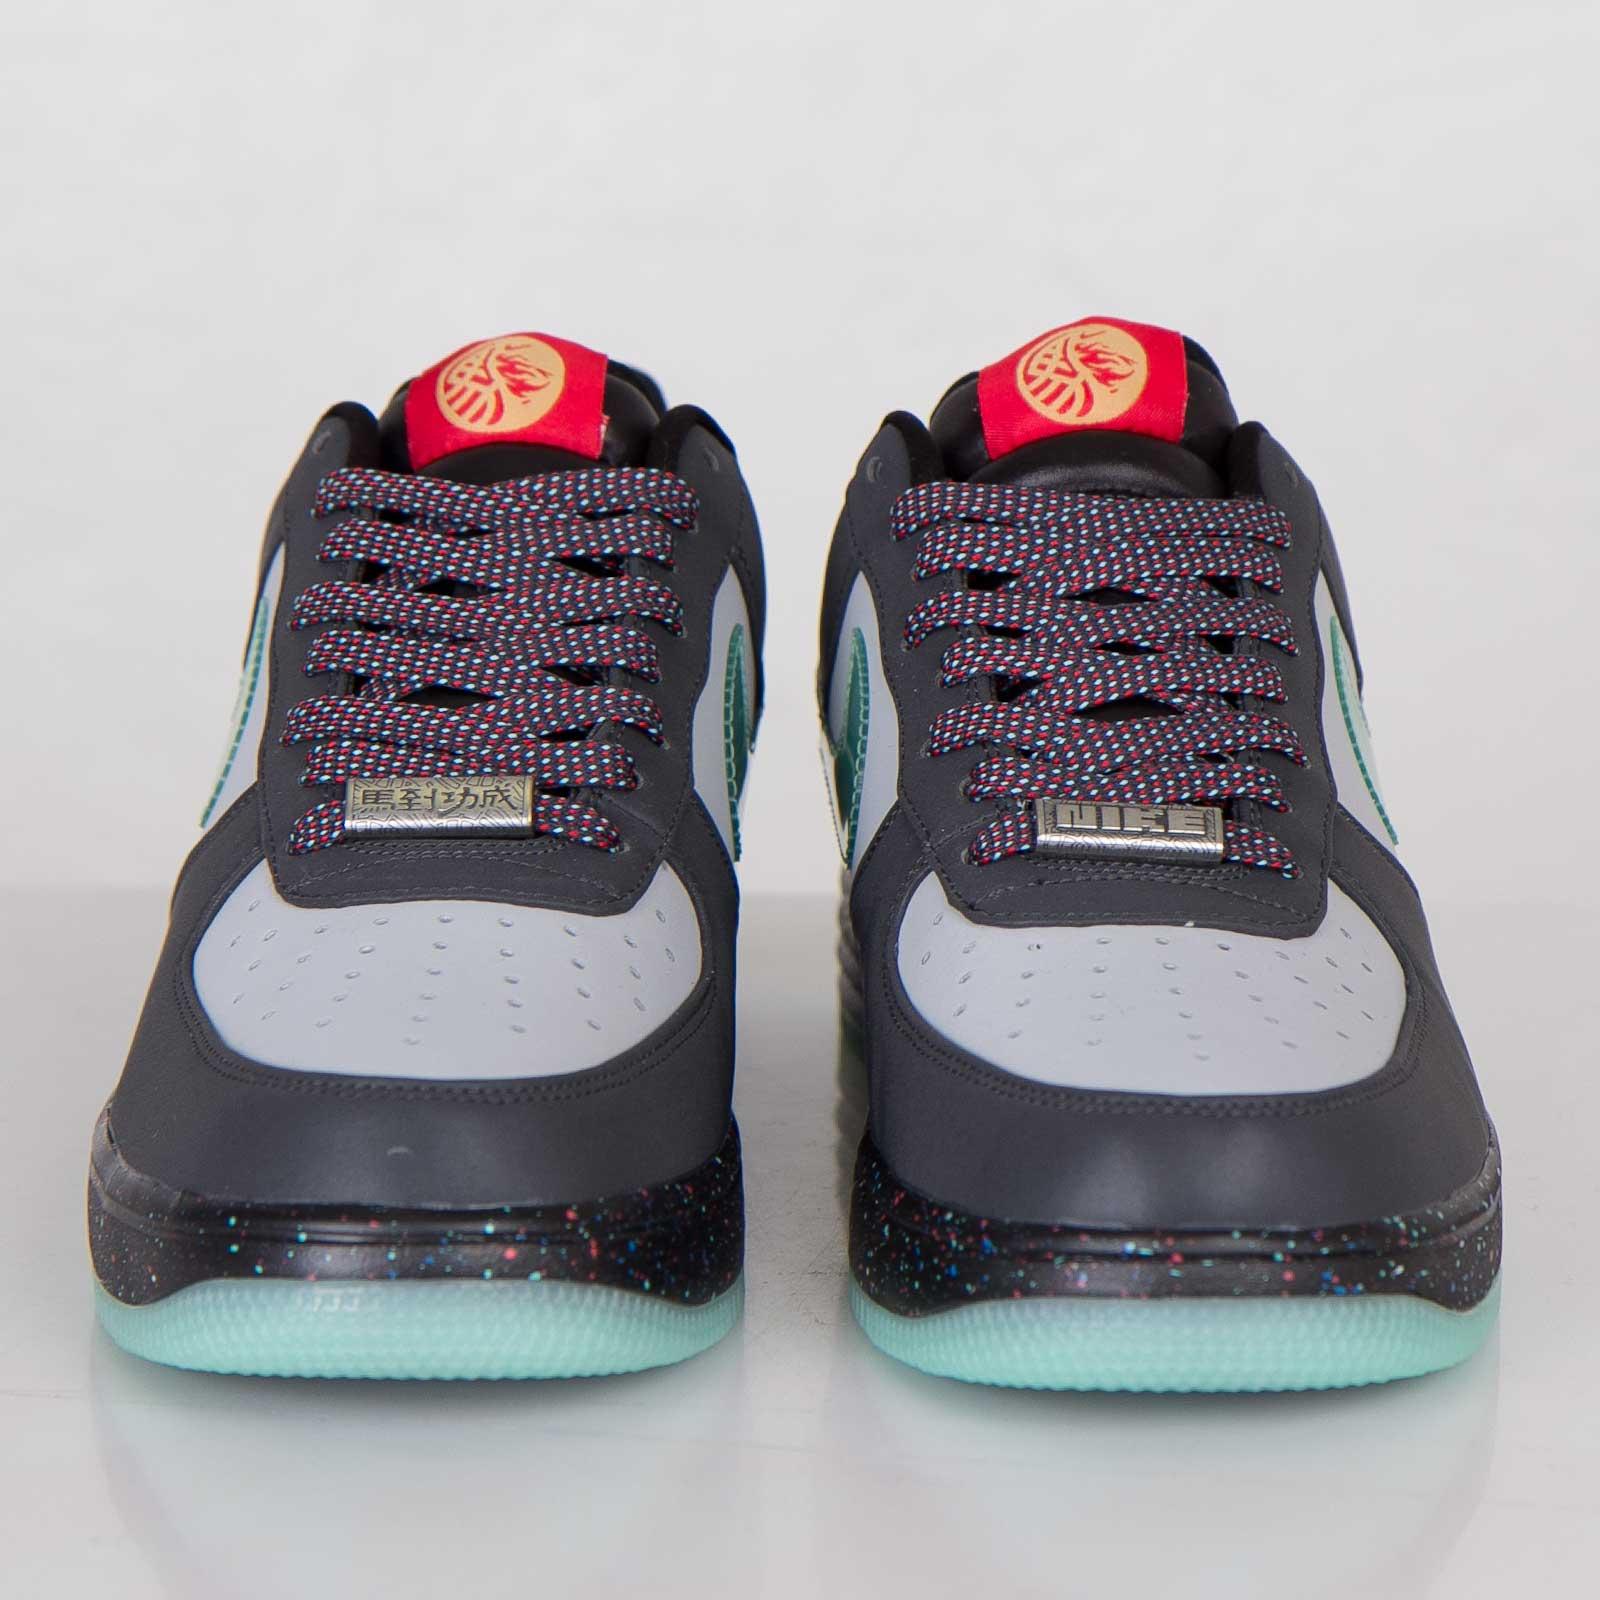 Nike Lunar Force 1 YOH QS - 647595-001 - Sneakersnstuff  73c47e0d92d7